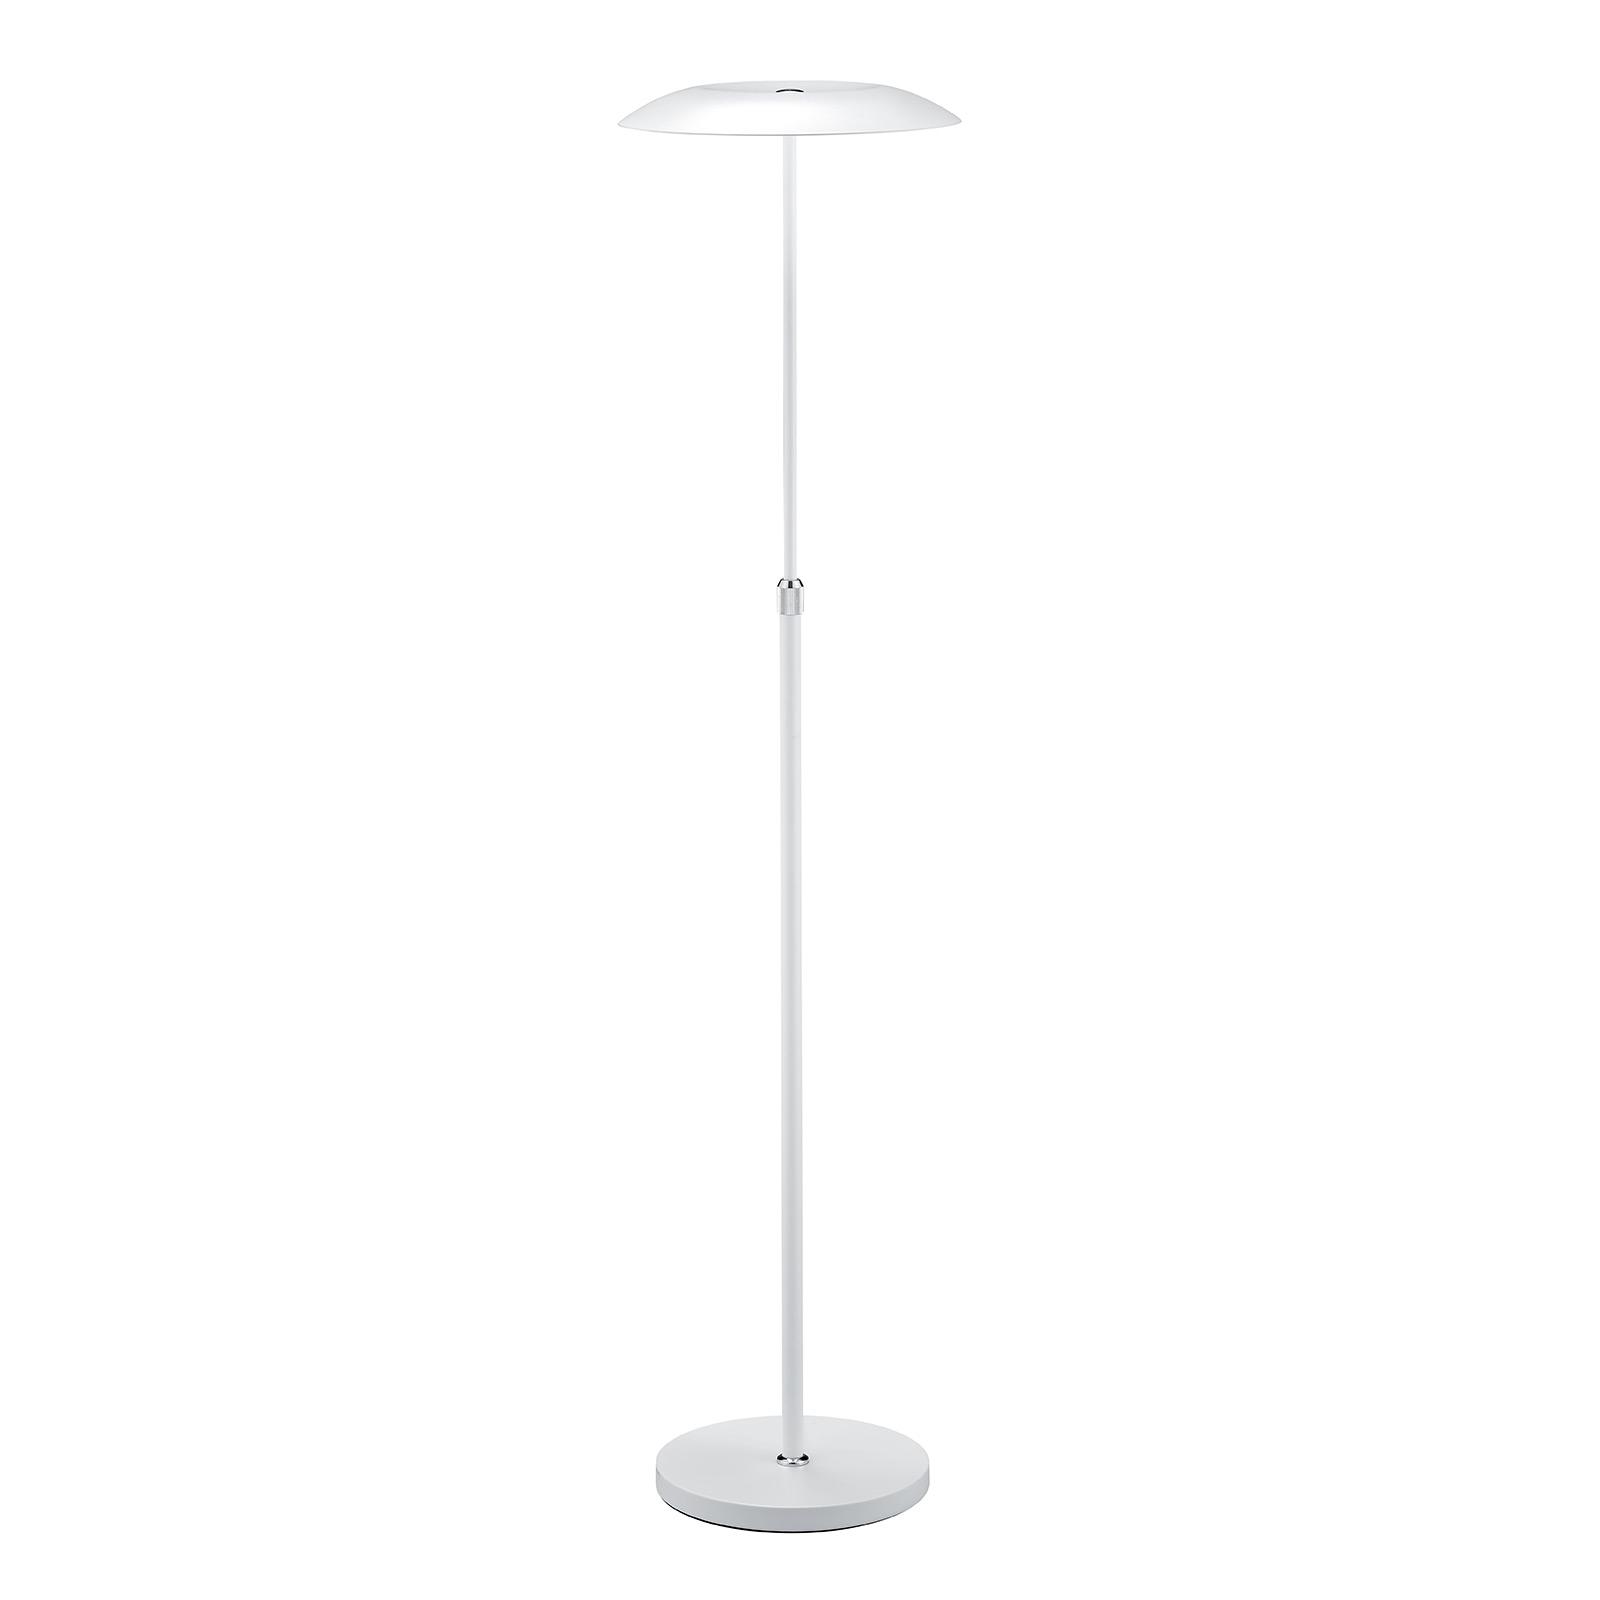 B-Leuchten Curling lampa stojąca LED biała